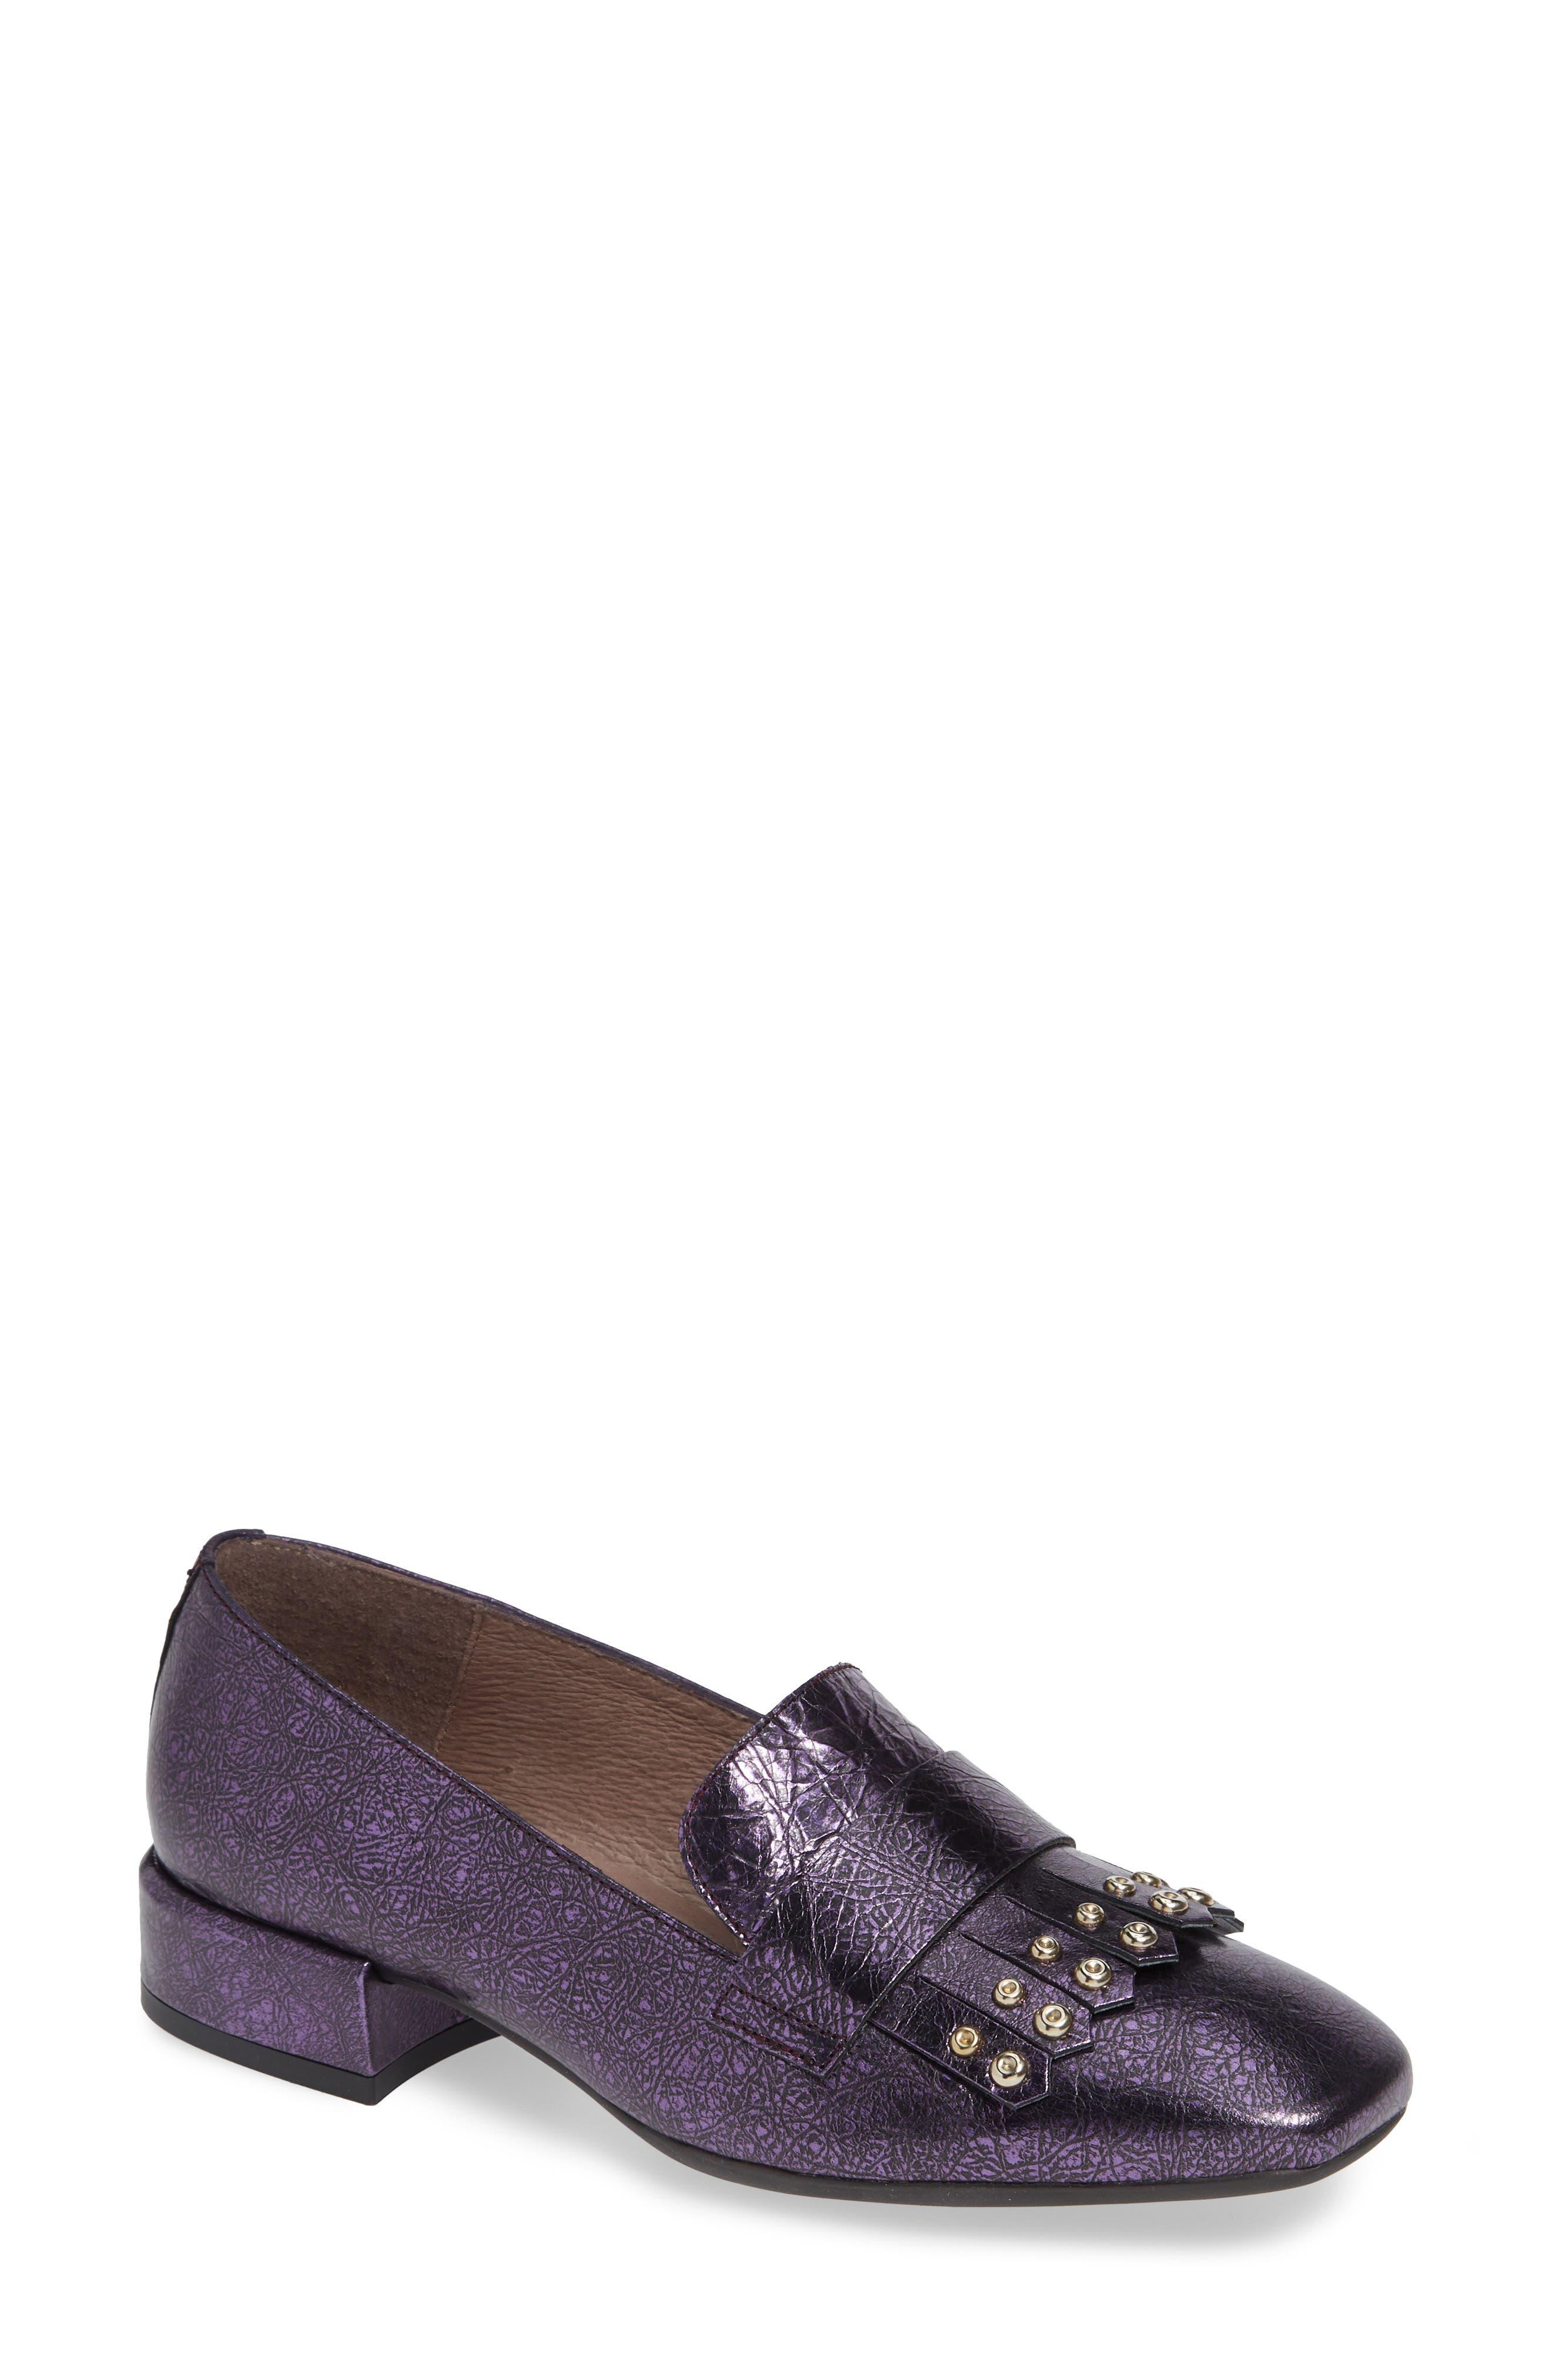 Wonders Low Heel Fringe Loafer - Purple